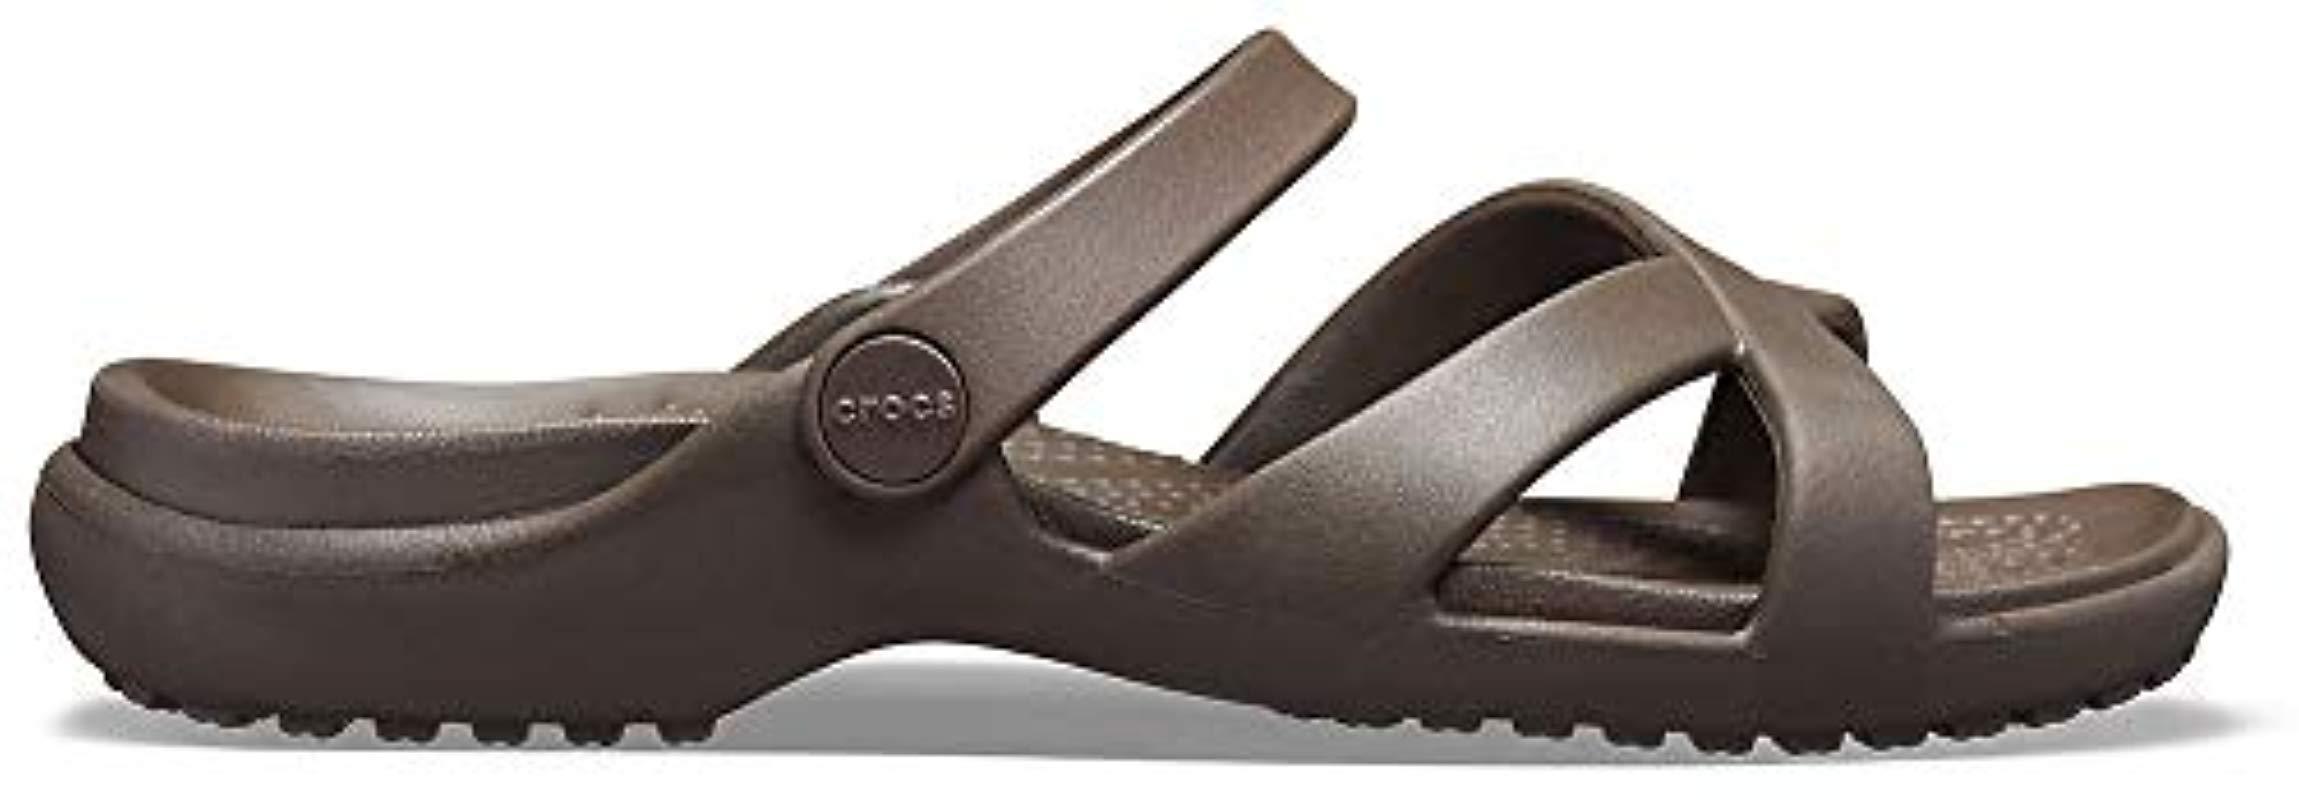 df64b4207 Crocs™ - Brown Meleen Cross Band Slide Sandal - Lyst. View fullscreen